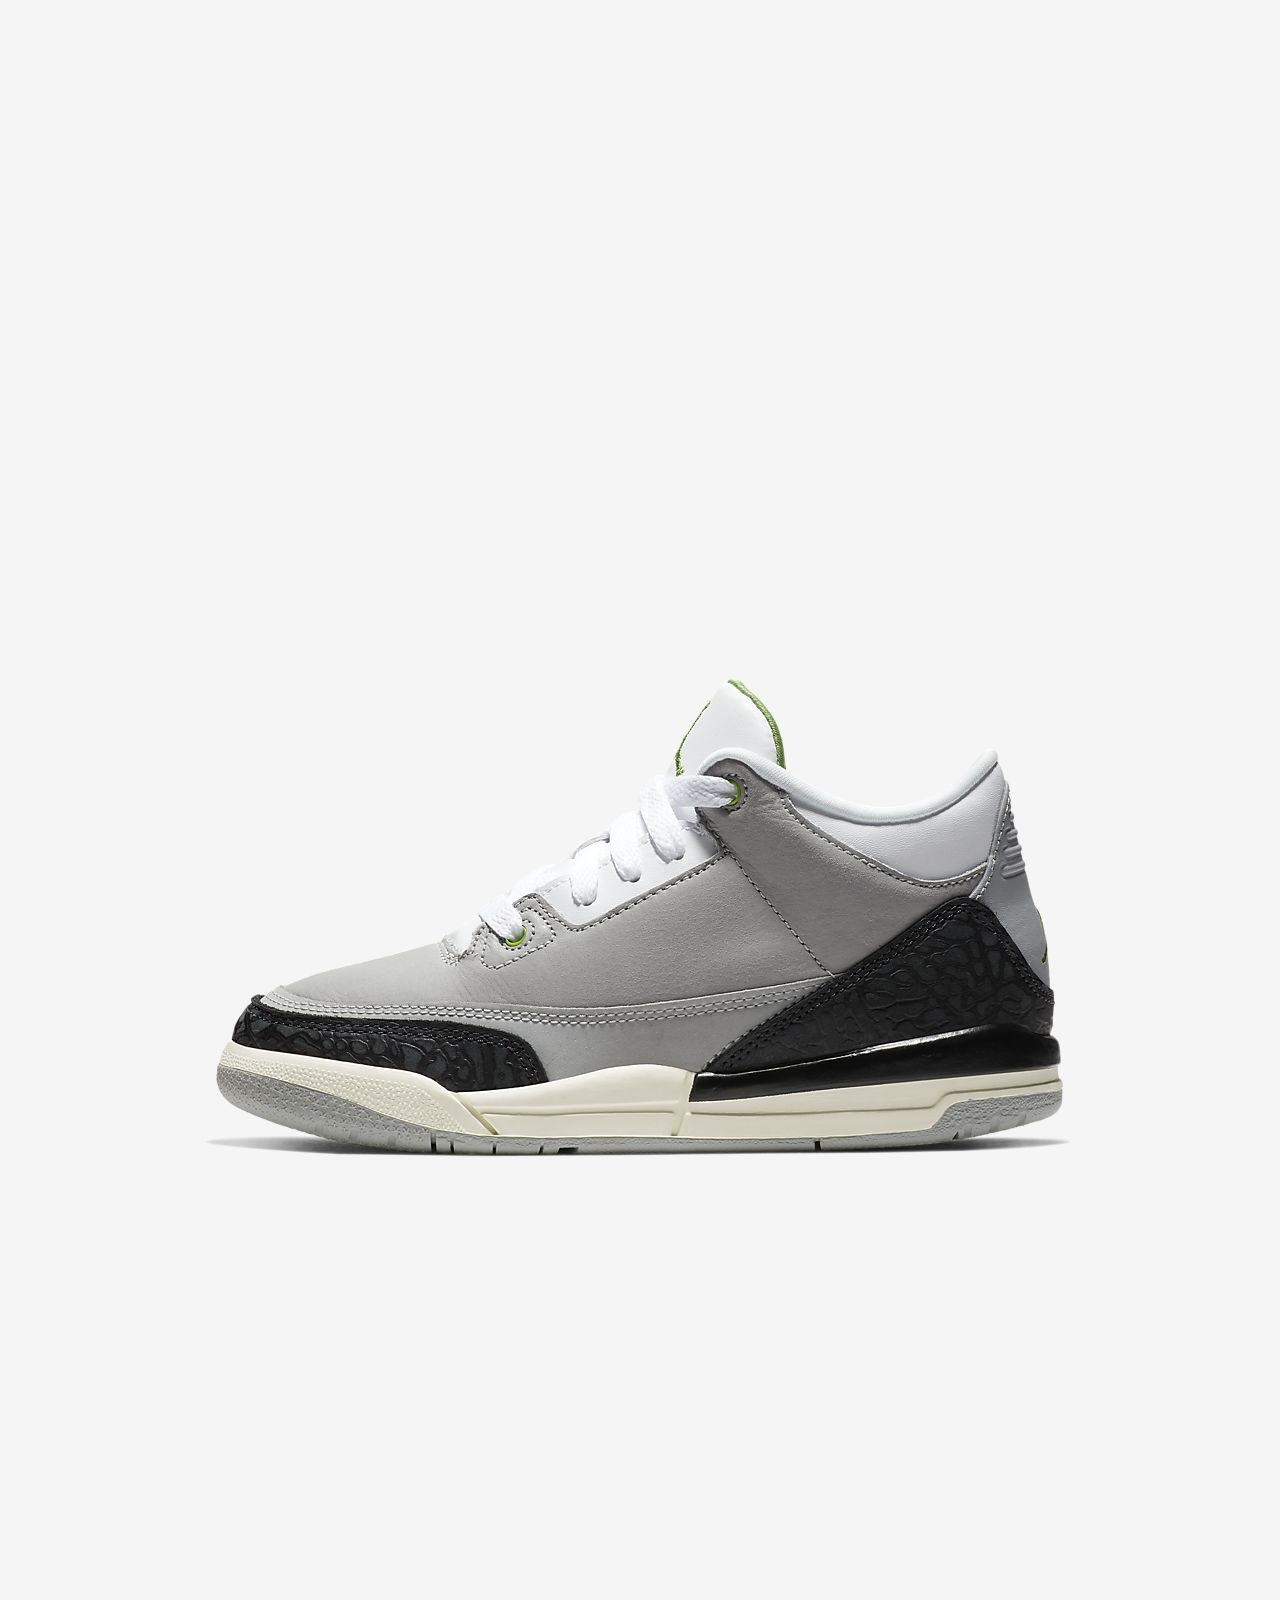 meet 61c8a b1f2c Air Jordan Retro 3 Younger Kids' Shoe